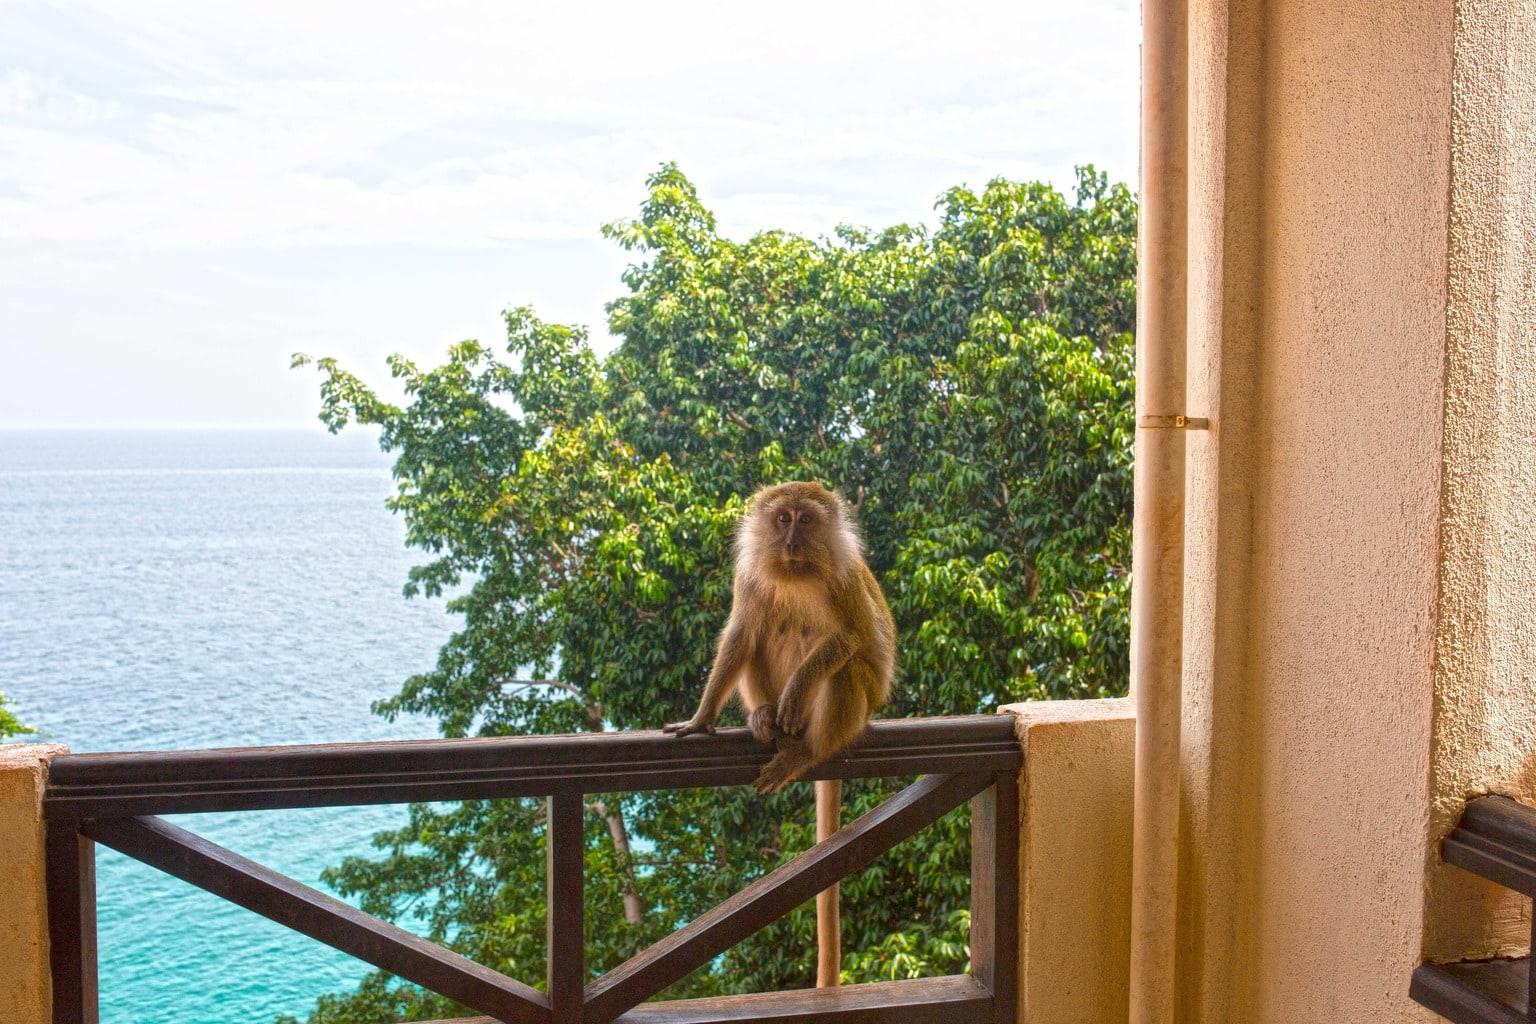 Monkey on the balcony